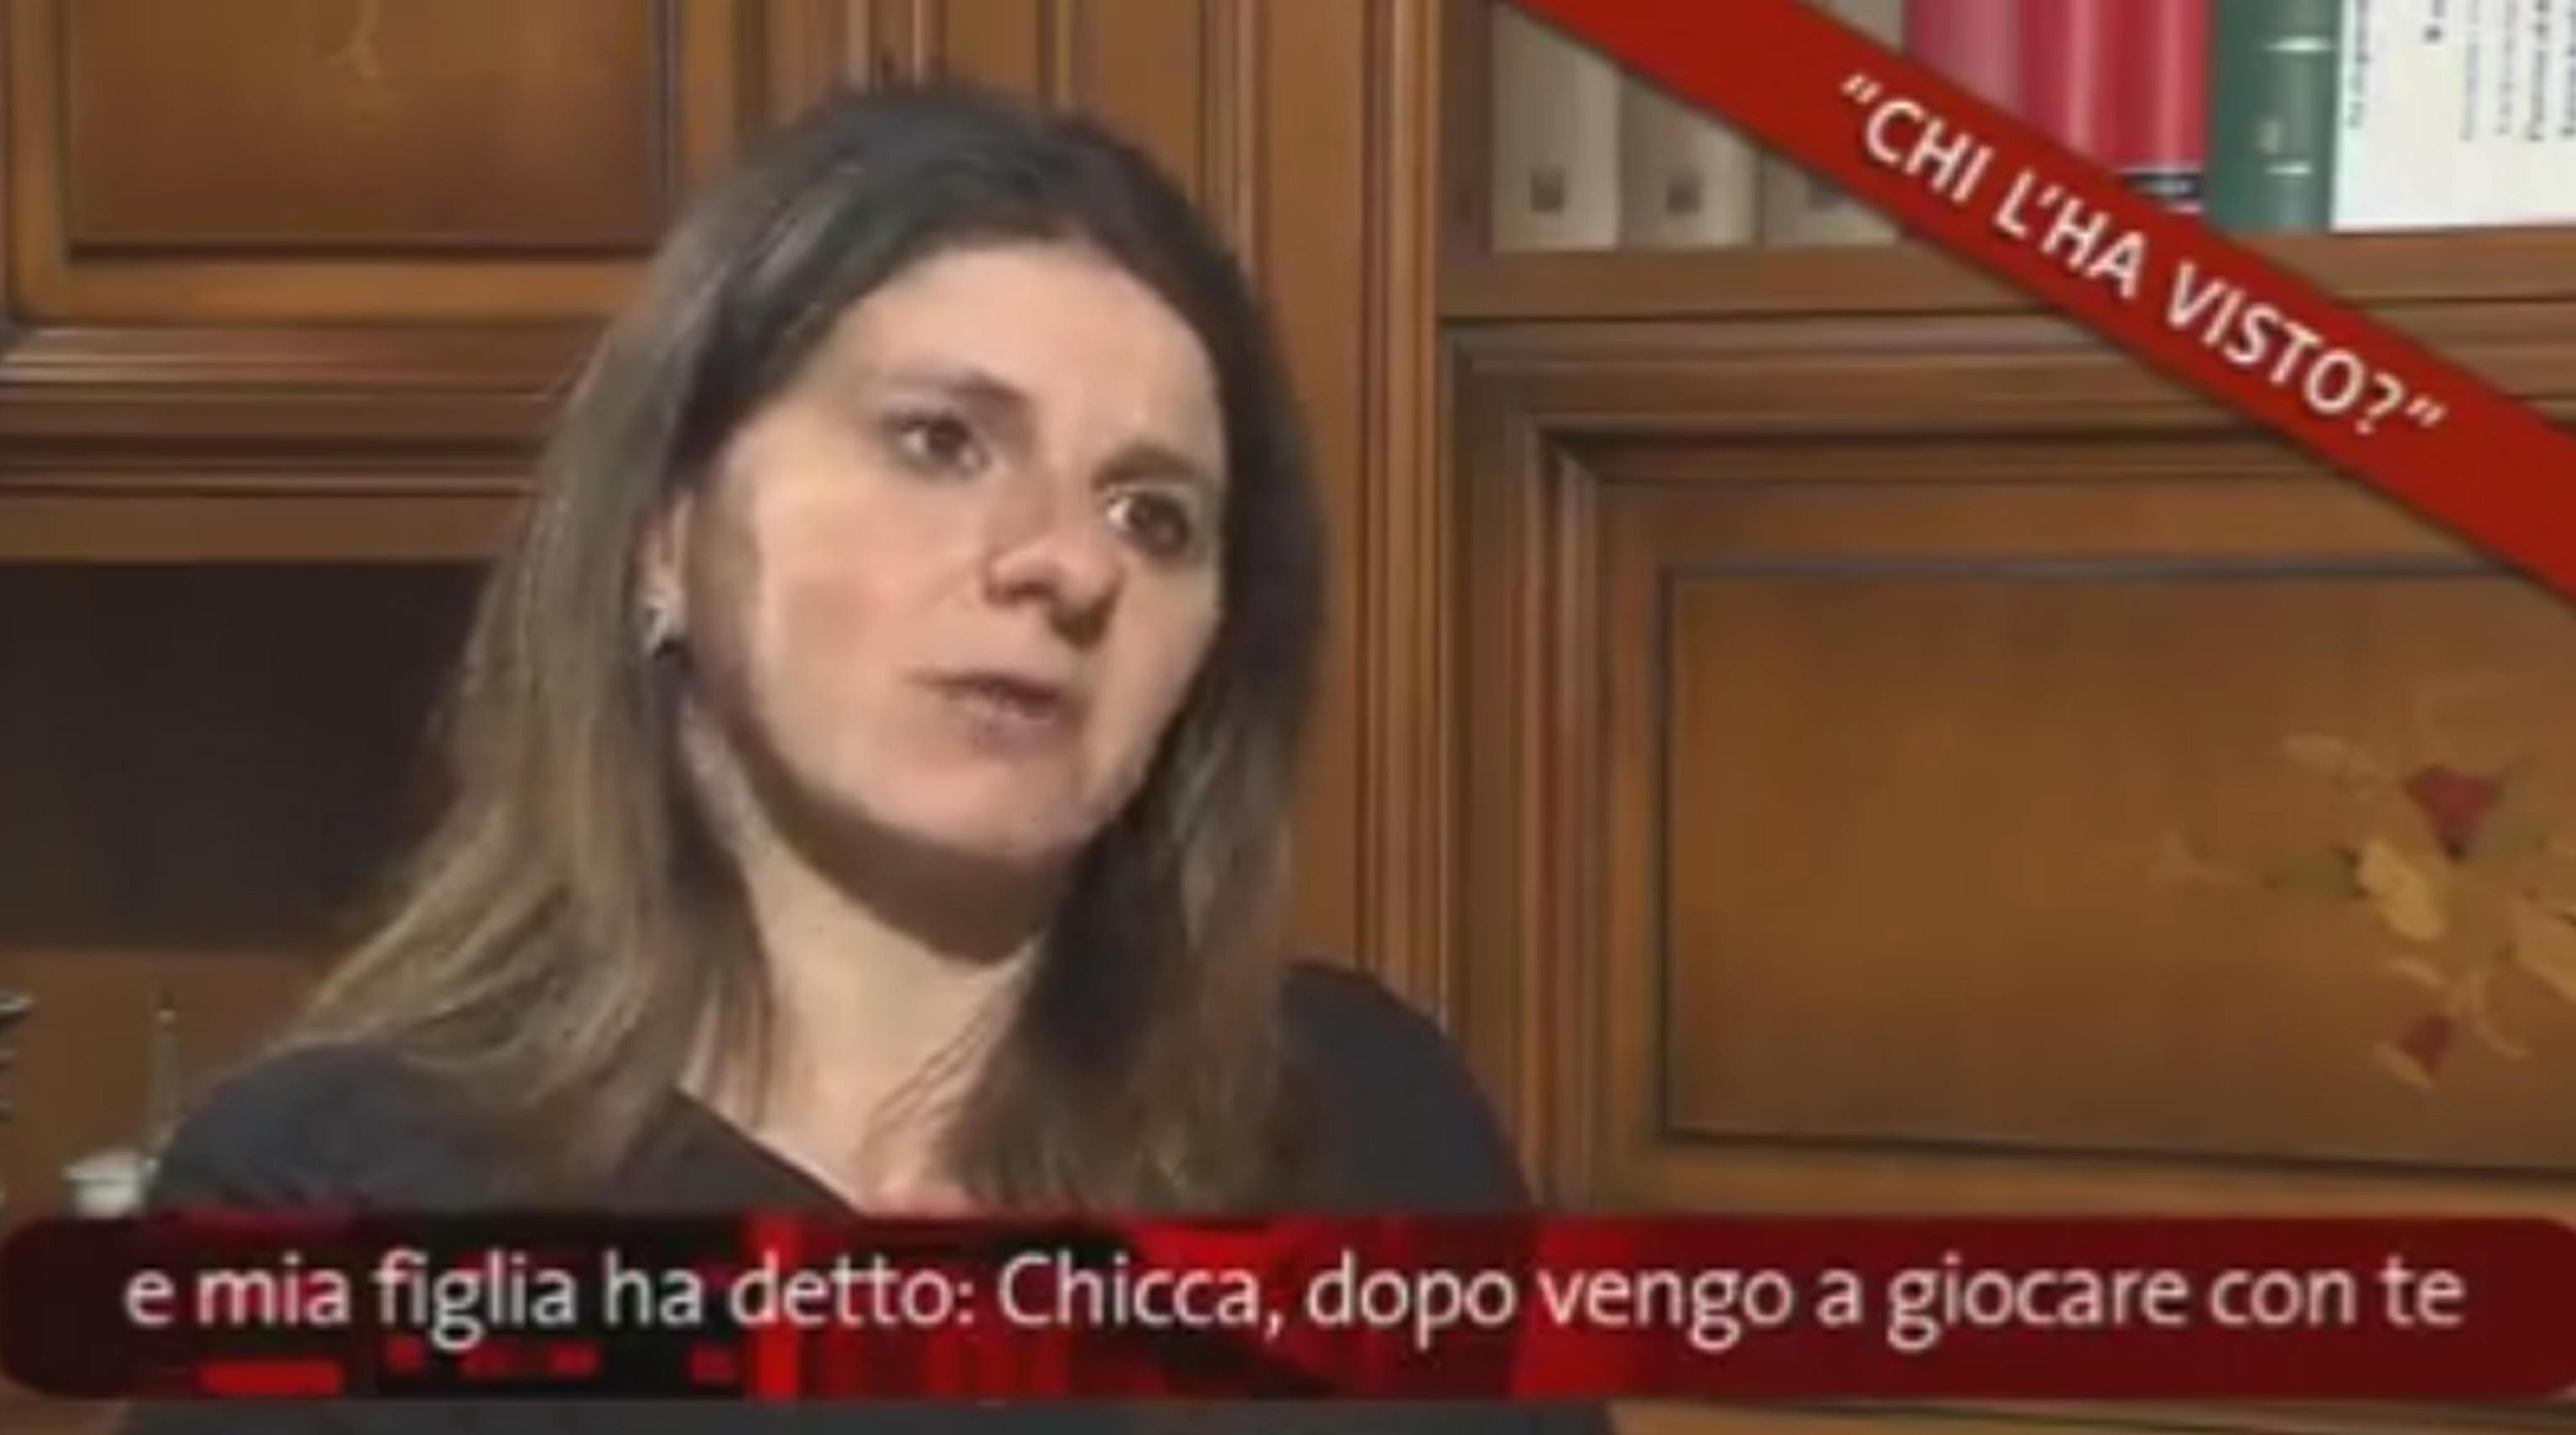 Marianna Fabozzi